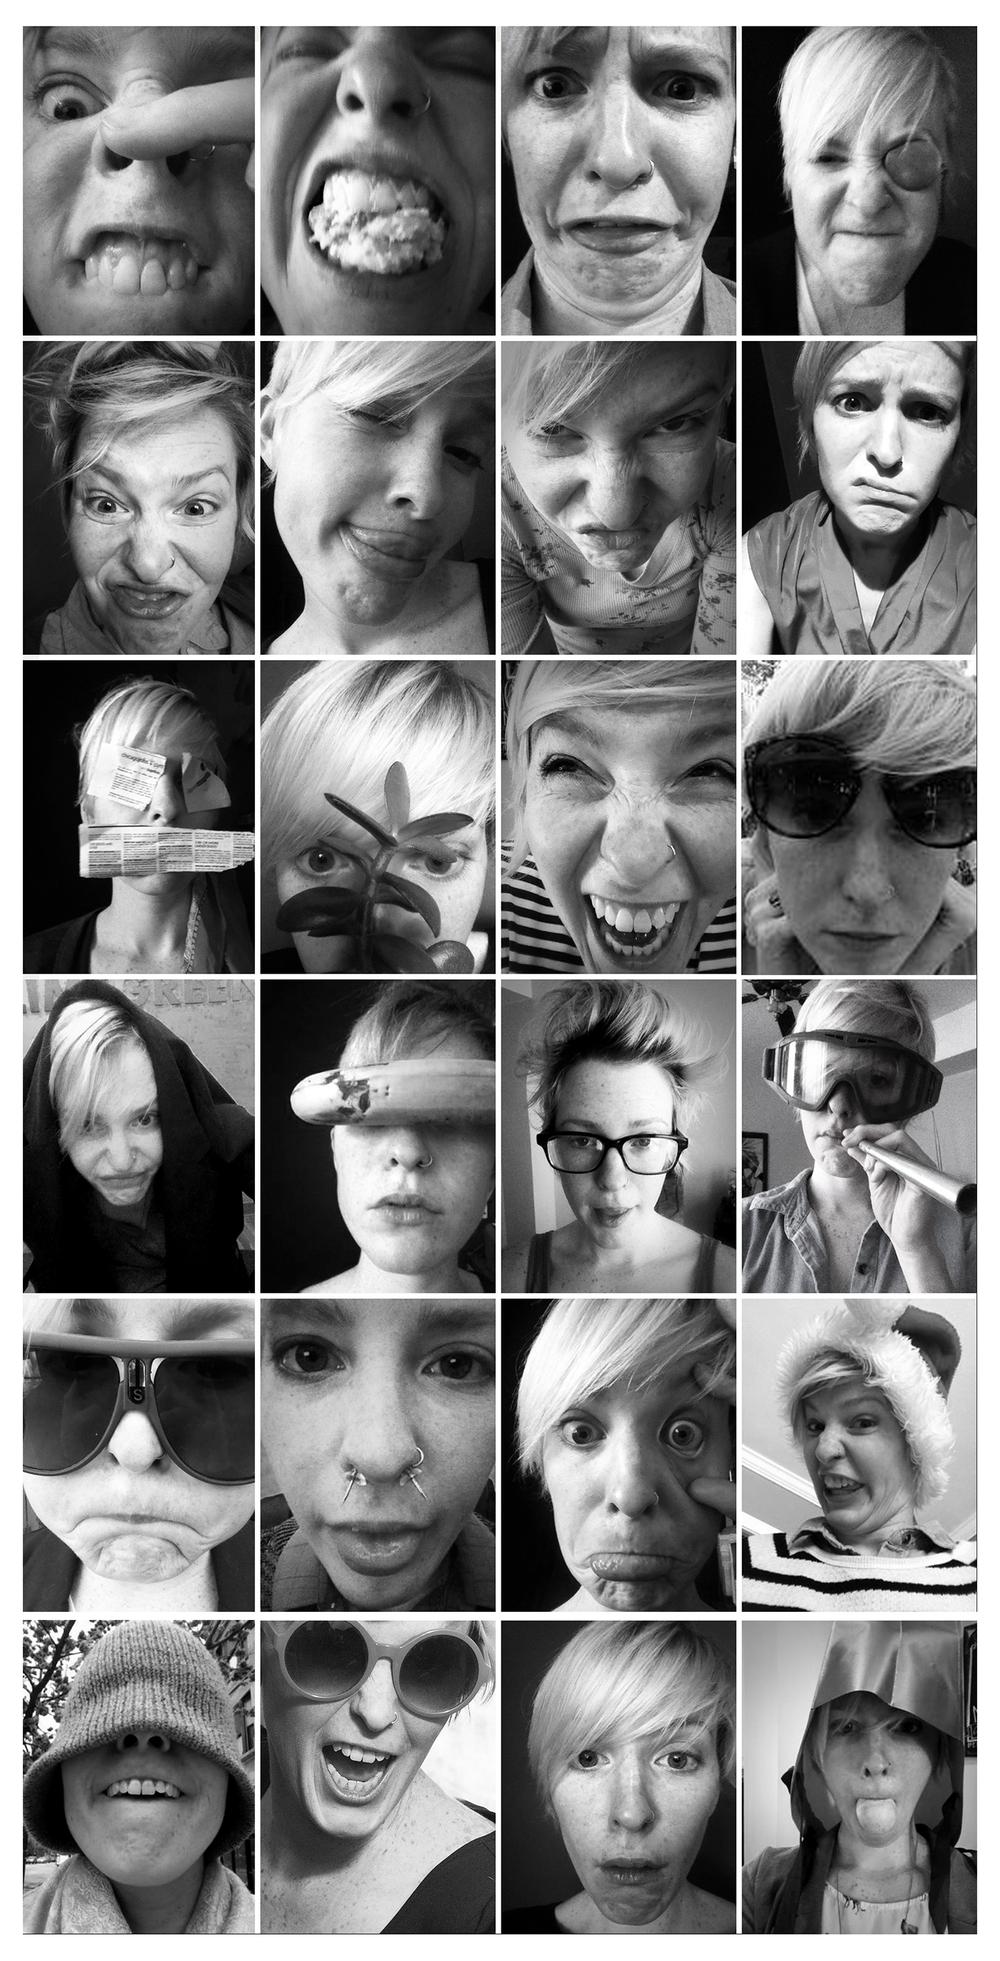 sillyfacefirday.jpg